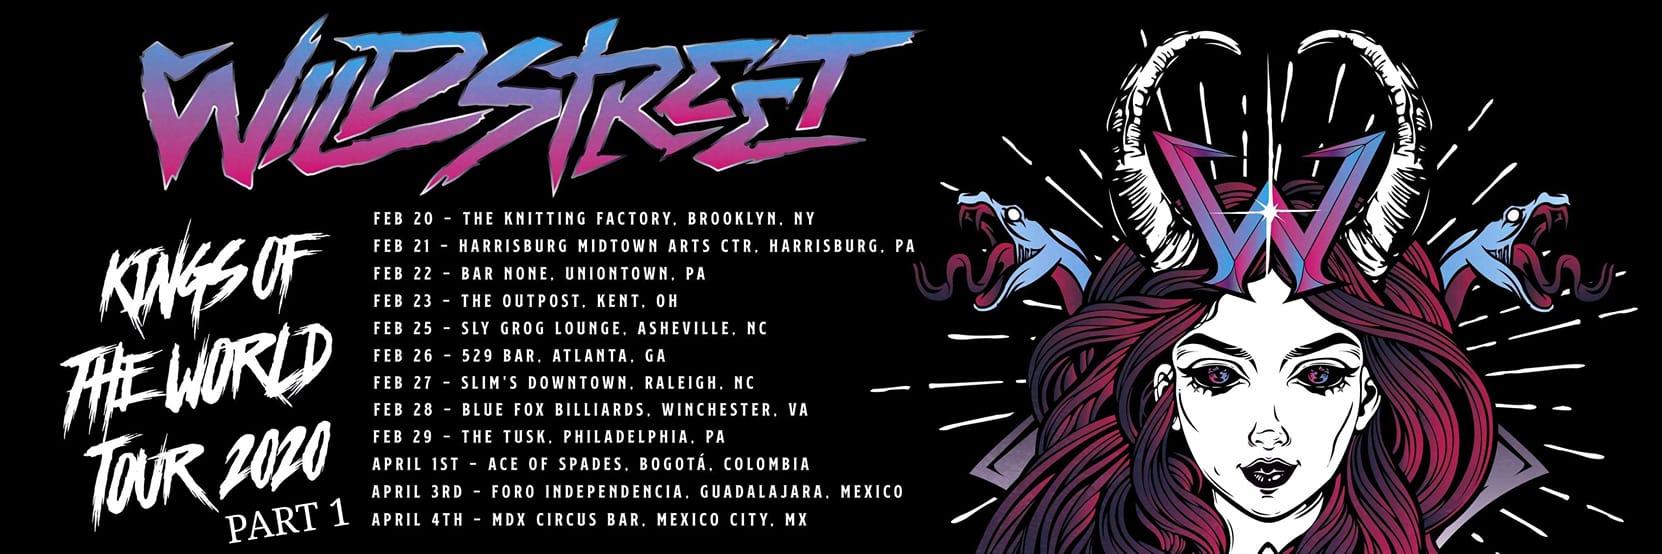 Wildstreet - Tour Dates